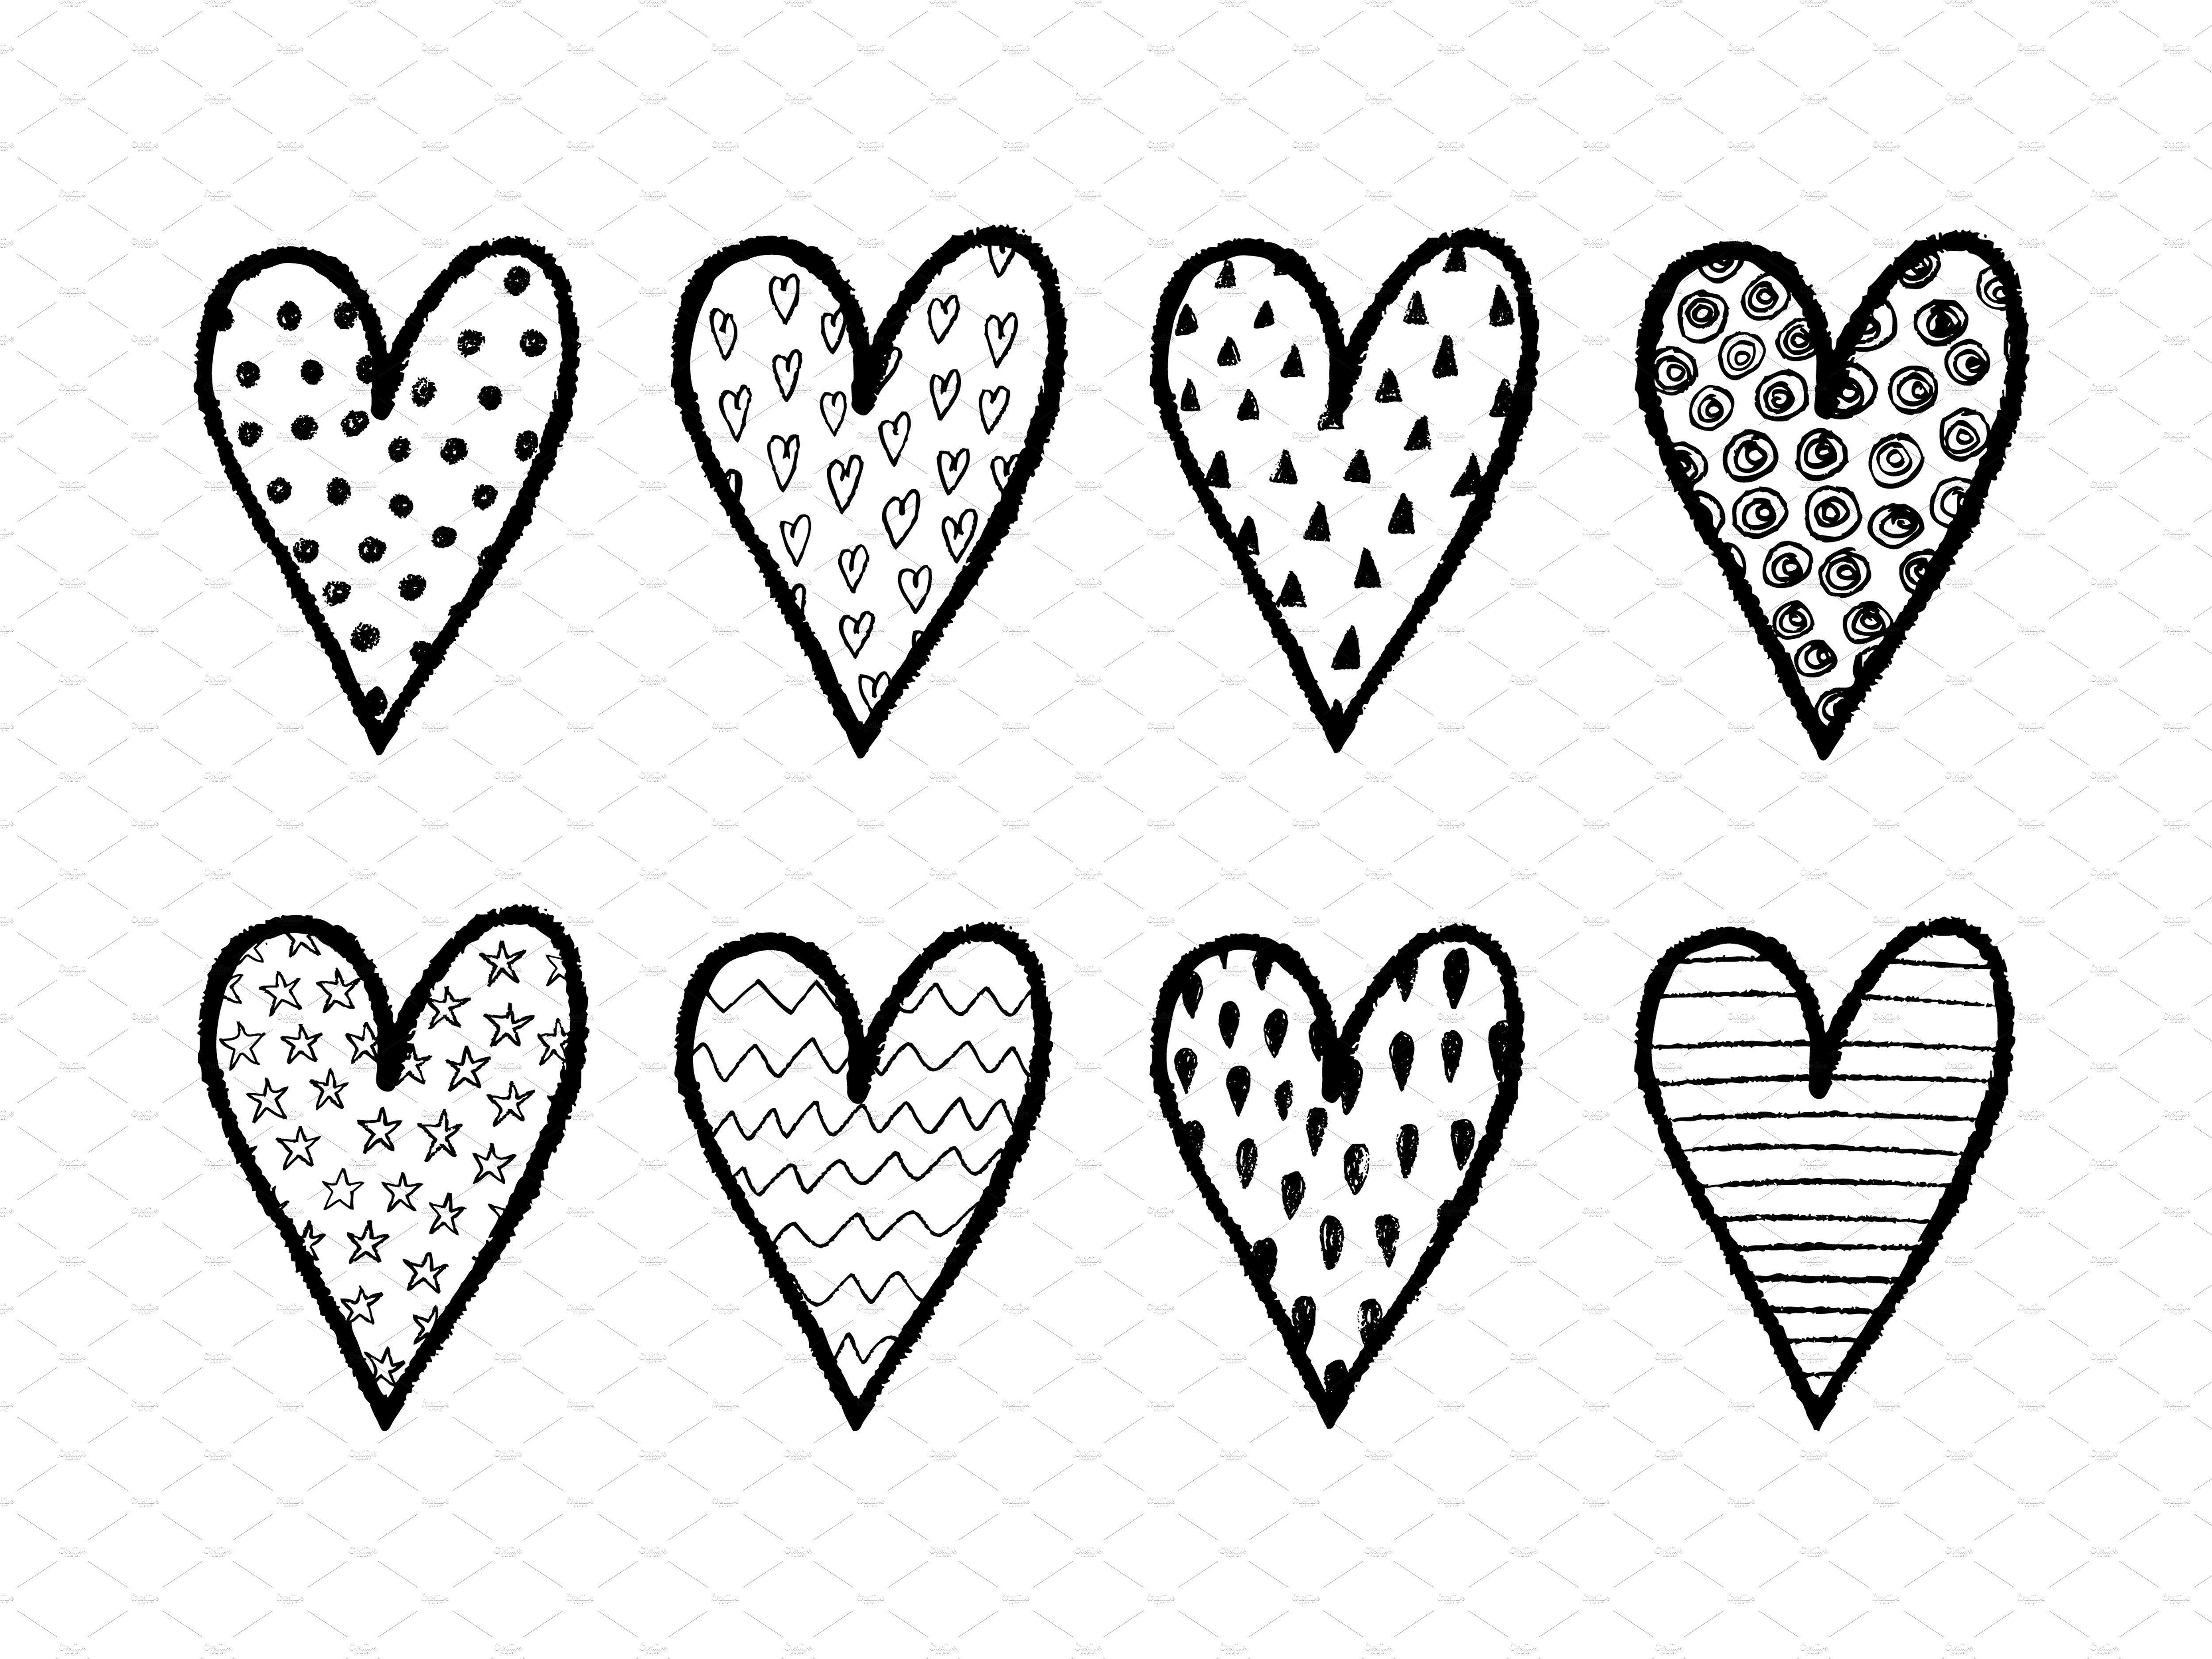 Drawn hearts Drawn Hand ~ set on